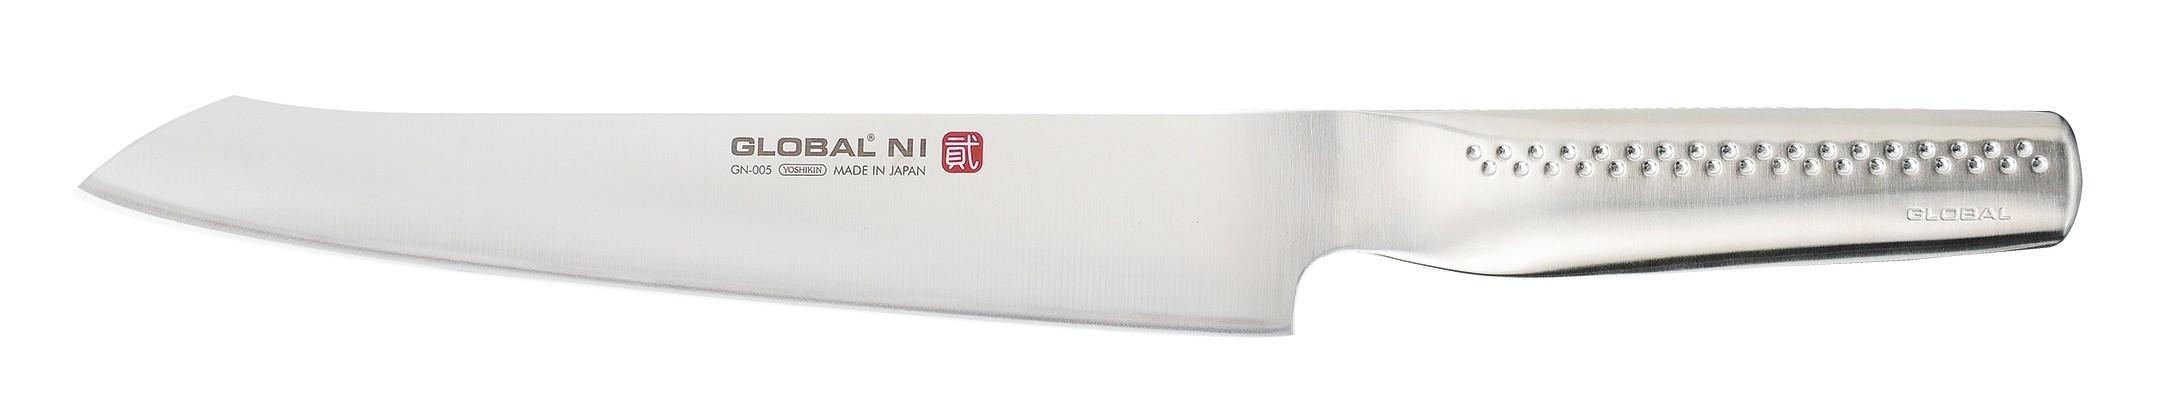 Global Knives NI Series 23cm Slicer Knife (GN-005)